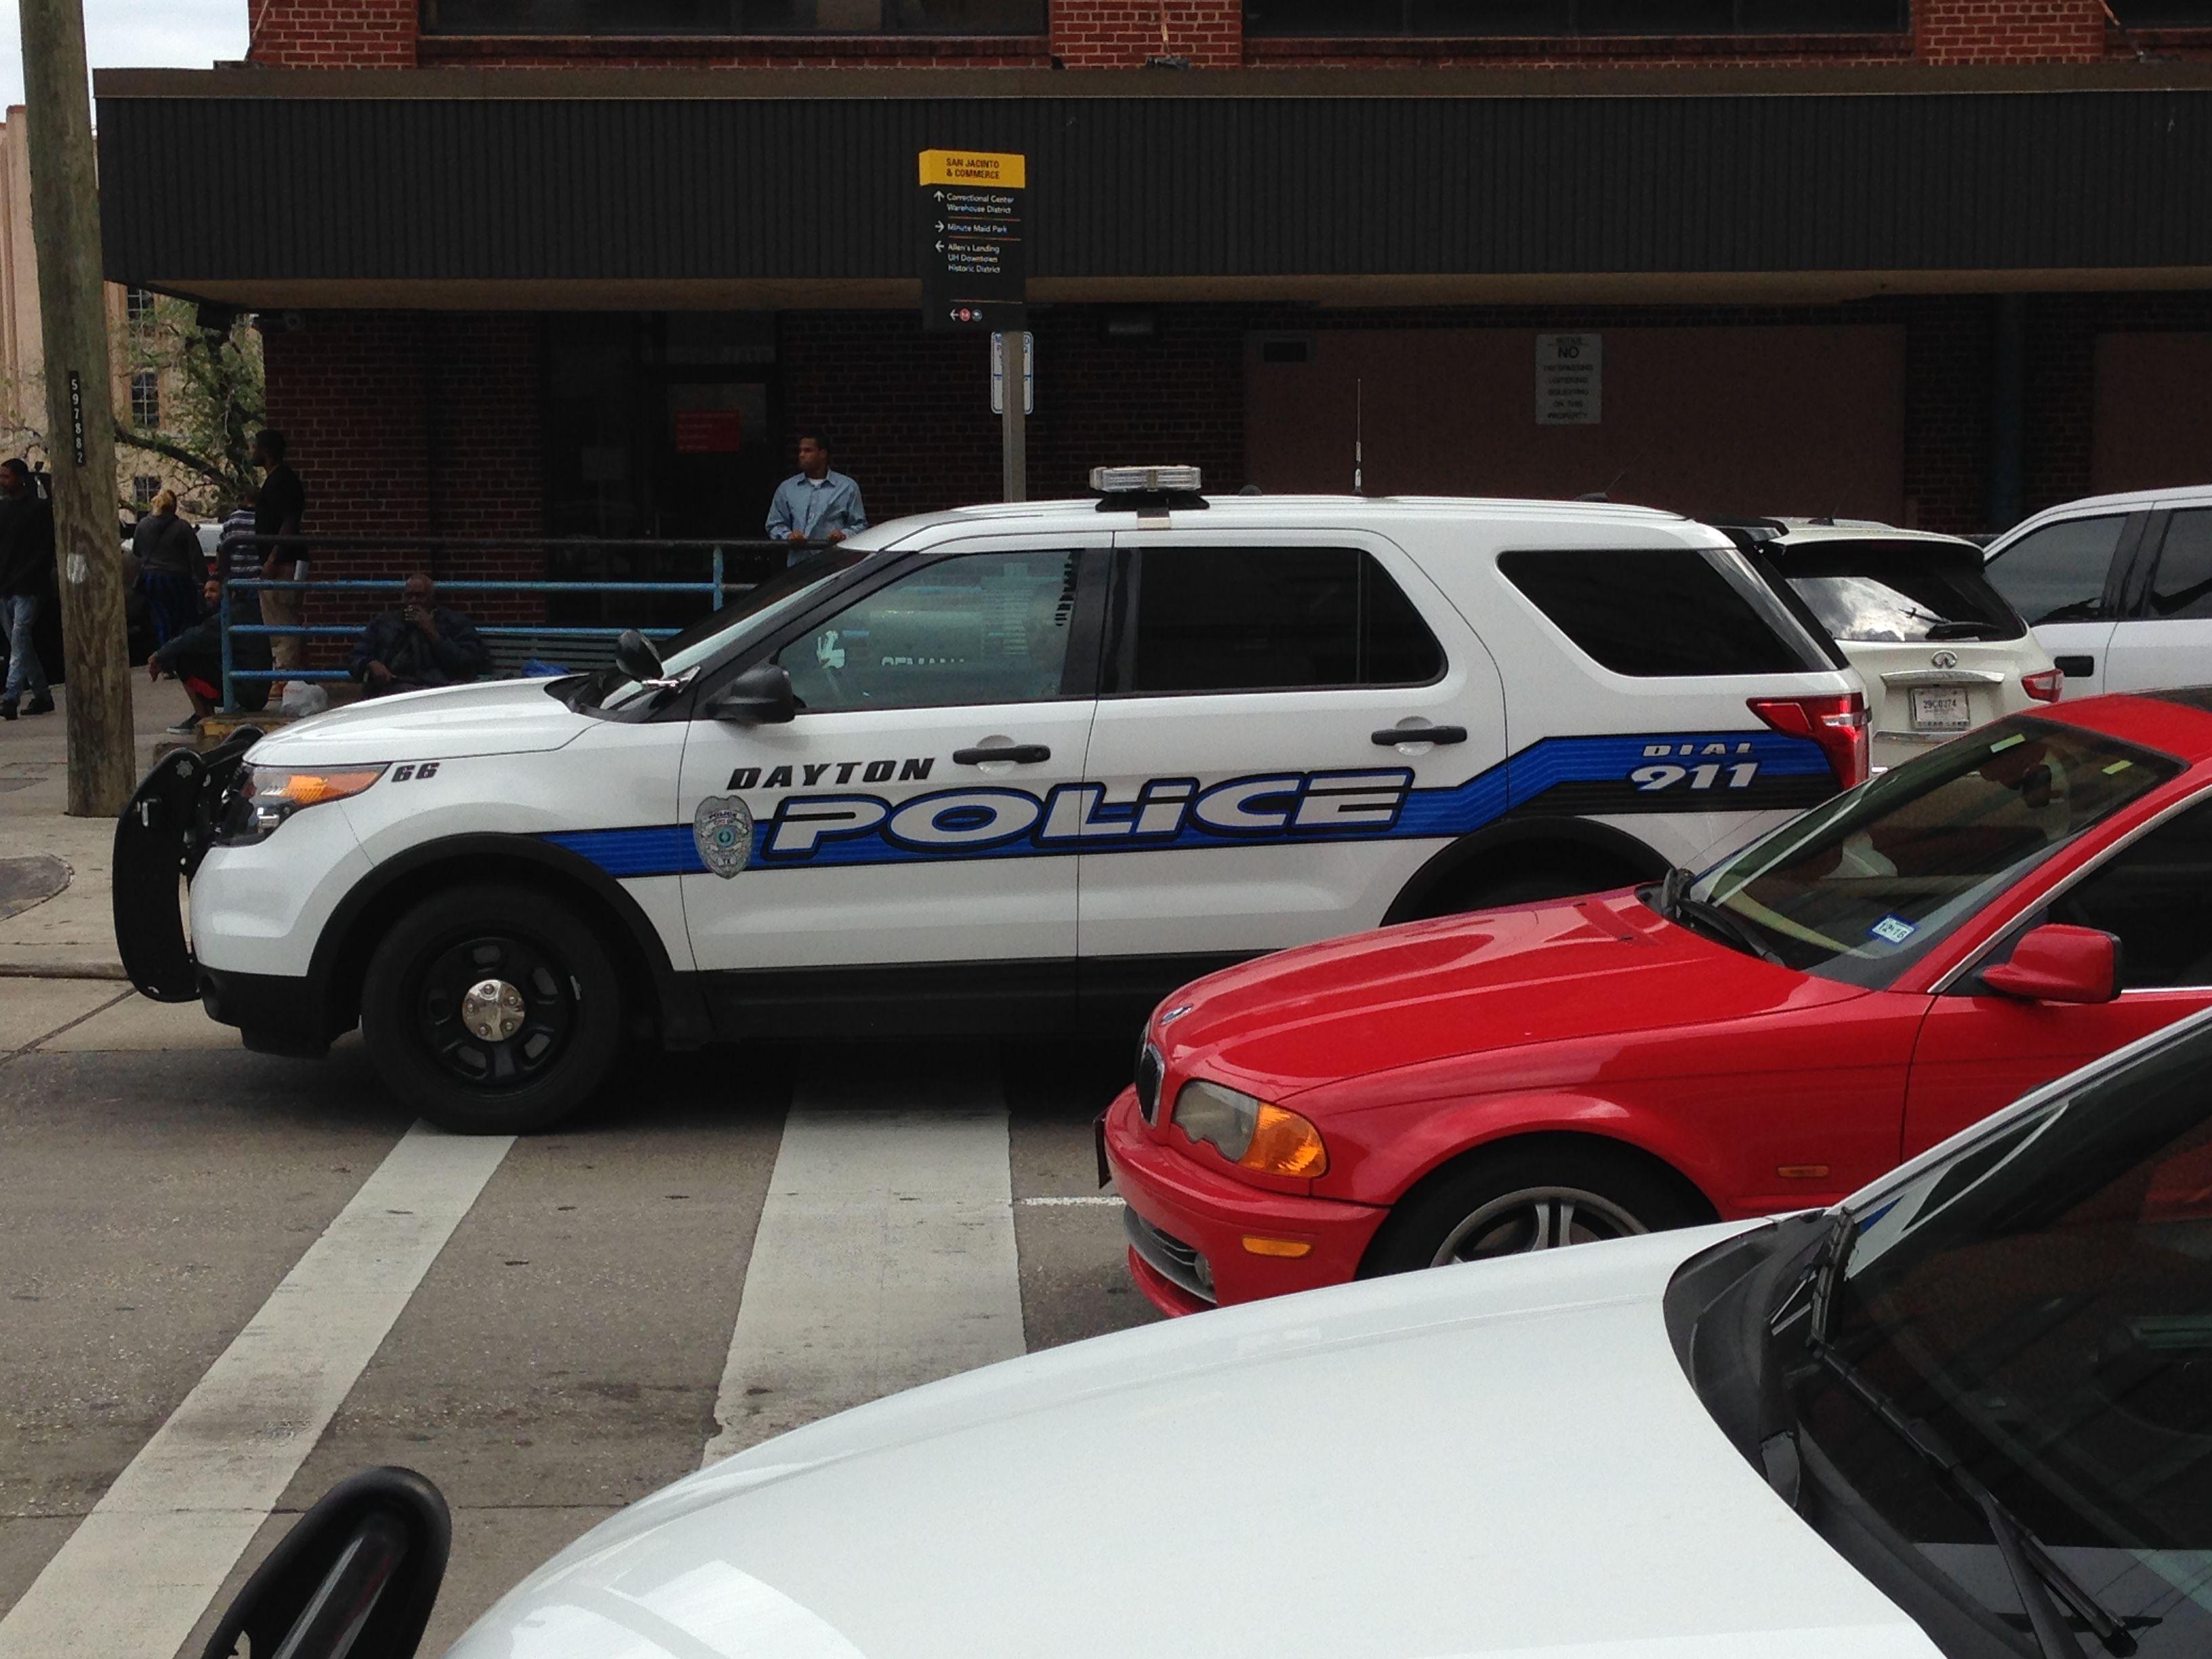 Dayton police dept ford pi suv texas police vehiclespolice carslaw enforcementfordtruckstexas